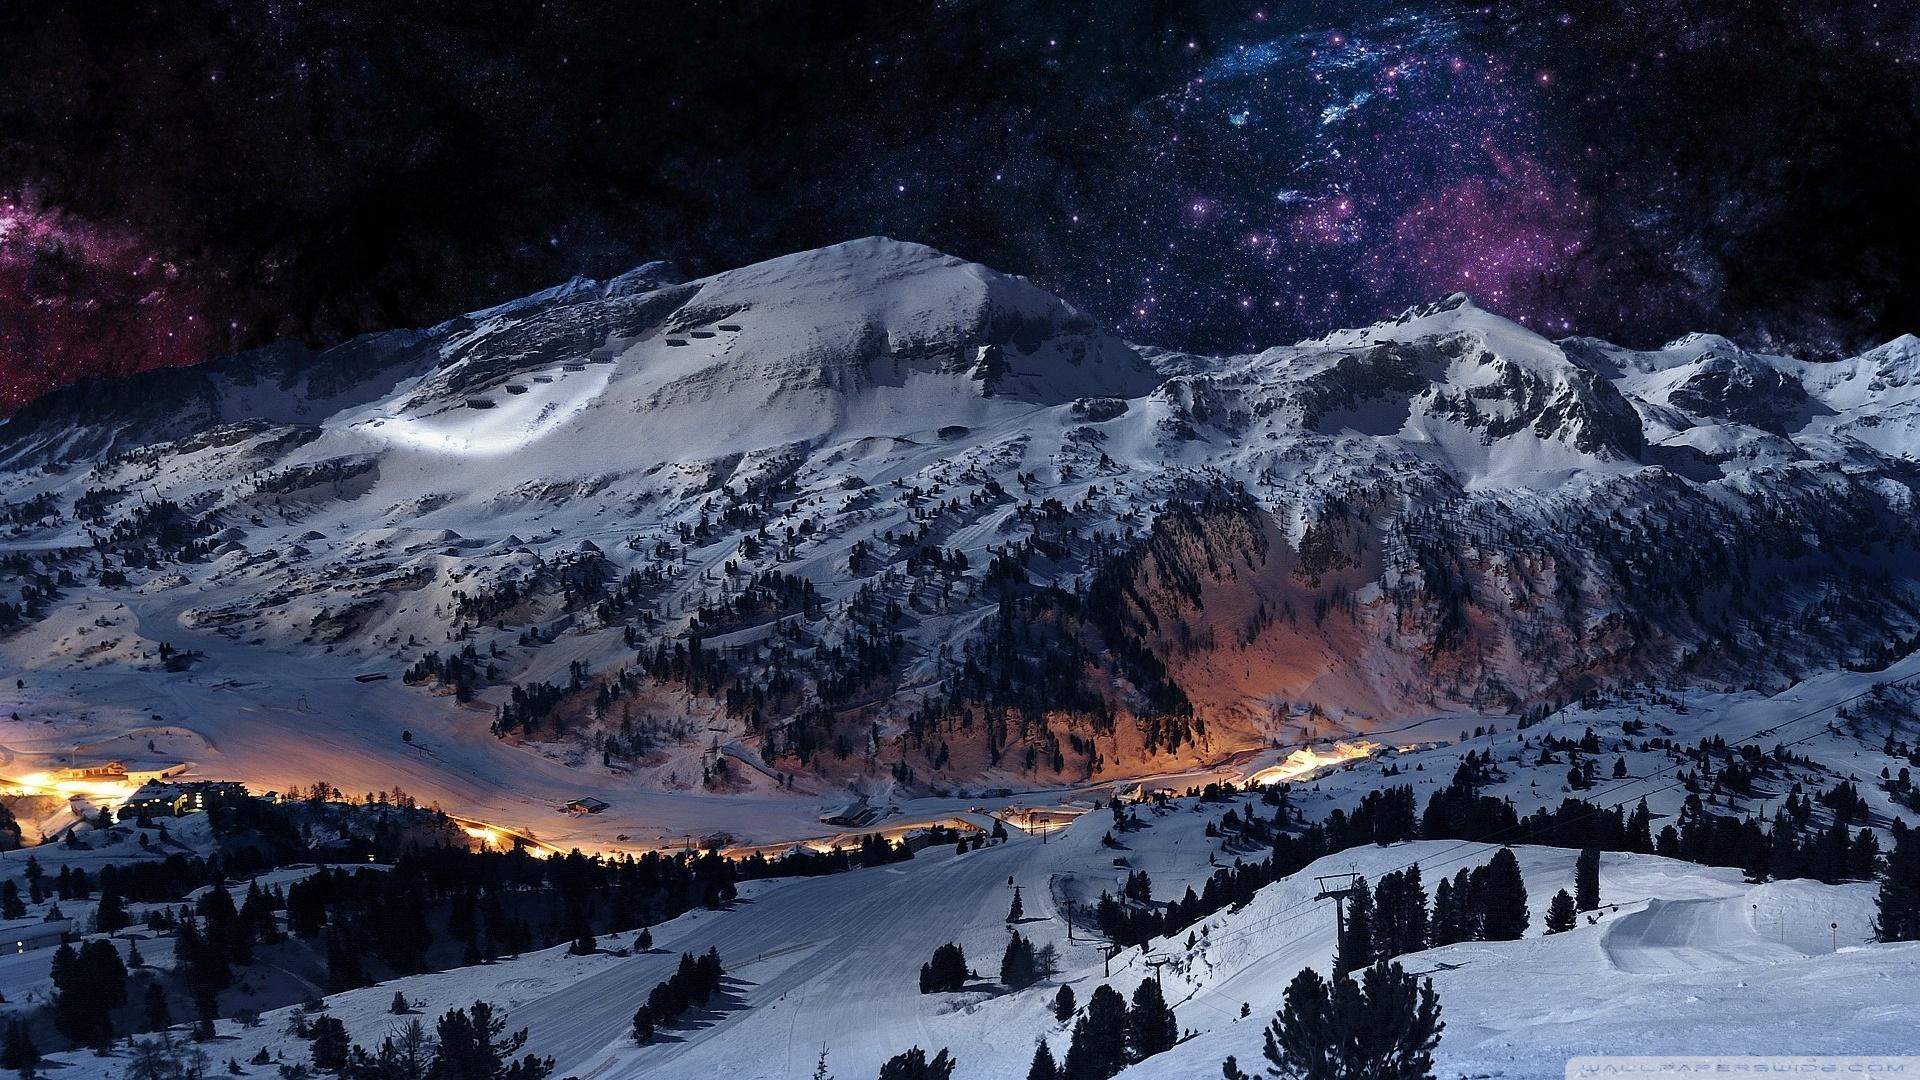 Snowy winter night scenes wallpaper wallpapersafari desktop wallpaper snow christmas christmas wallpaper with cabin 1920x1080 voltagebd Image collections